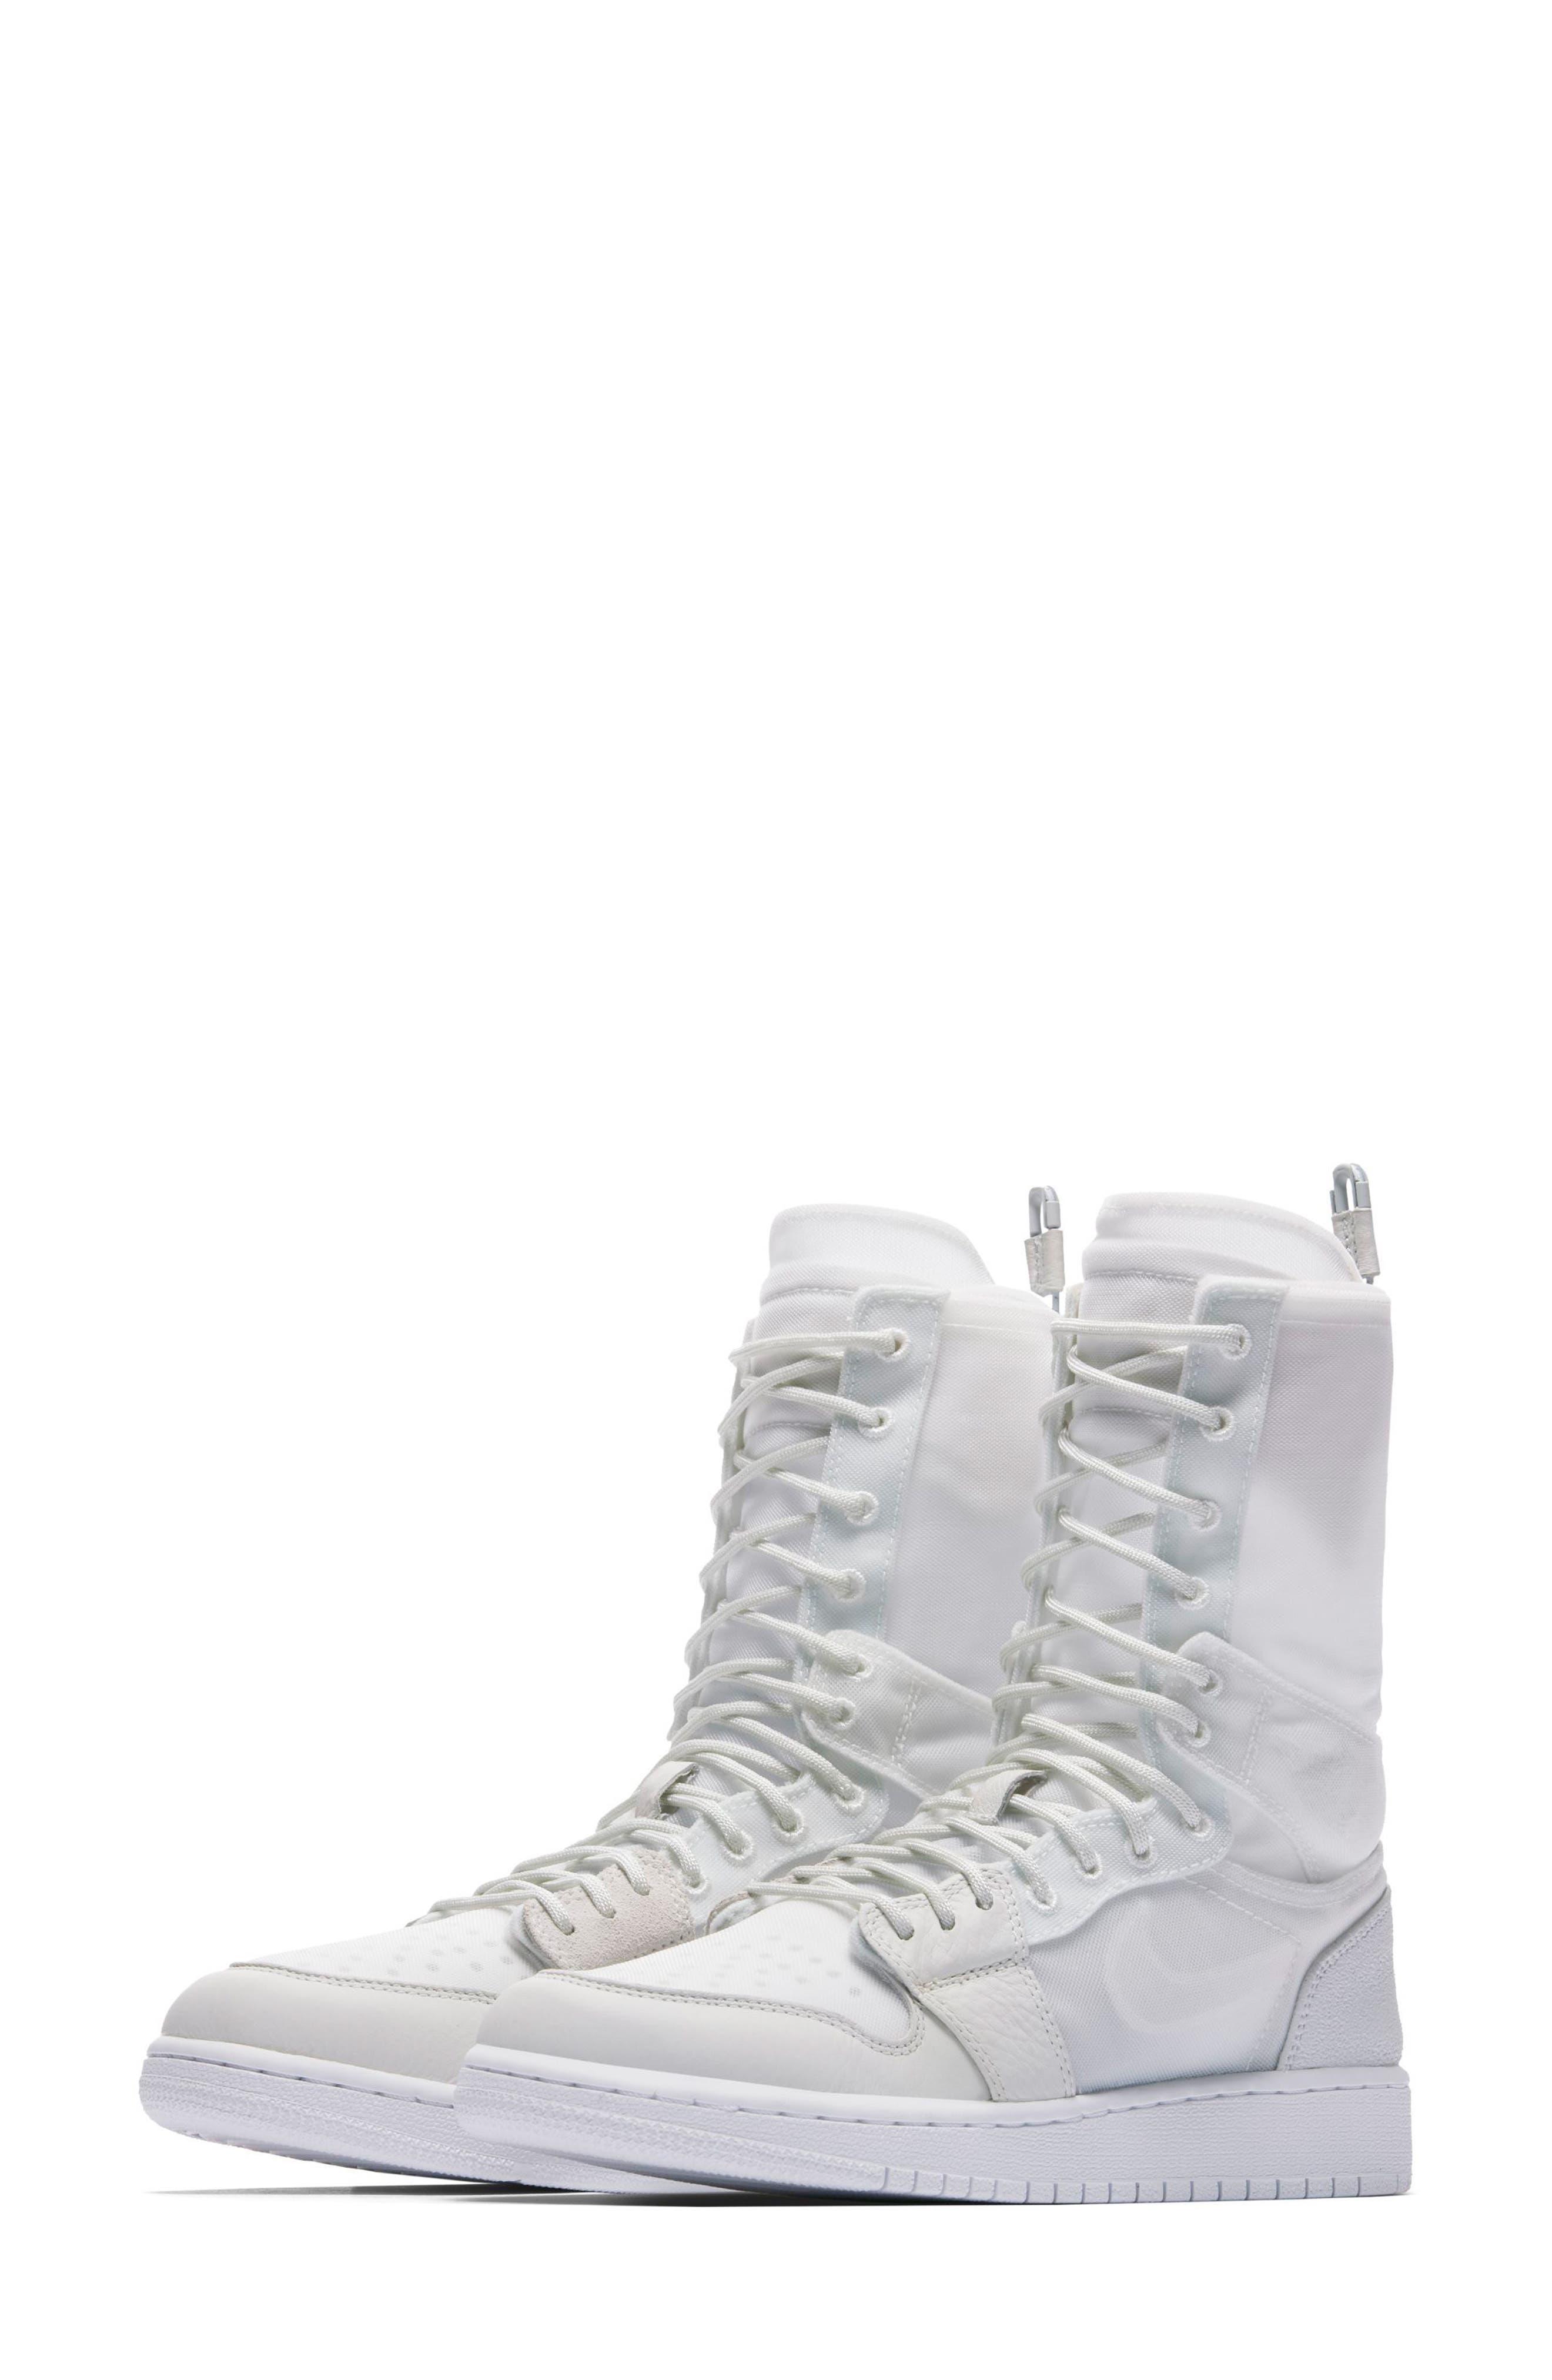 Air Jordan 1 Explorer XX Convertible High Top Sneaker,                         Main,                         color, Off White/ Off White